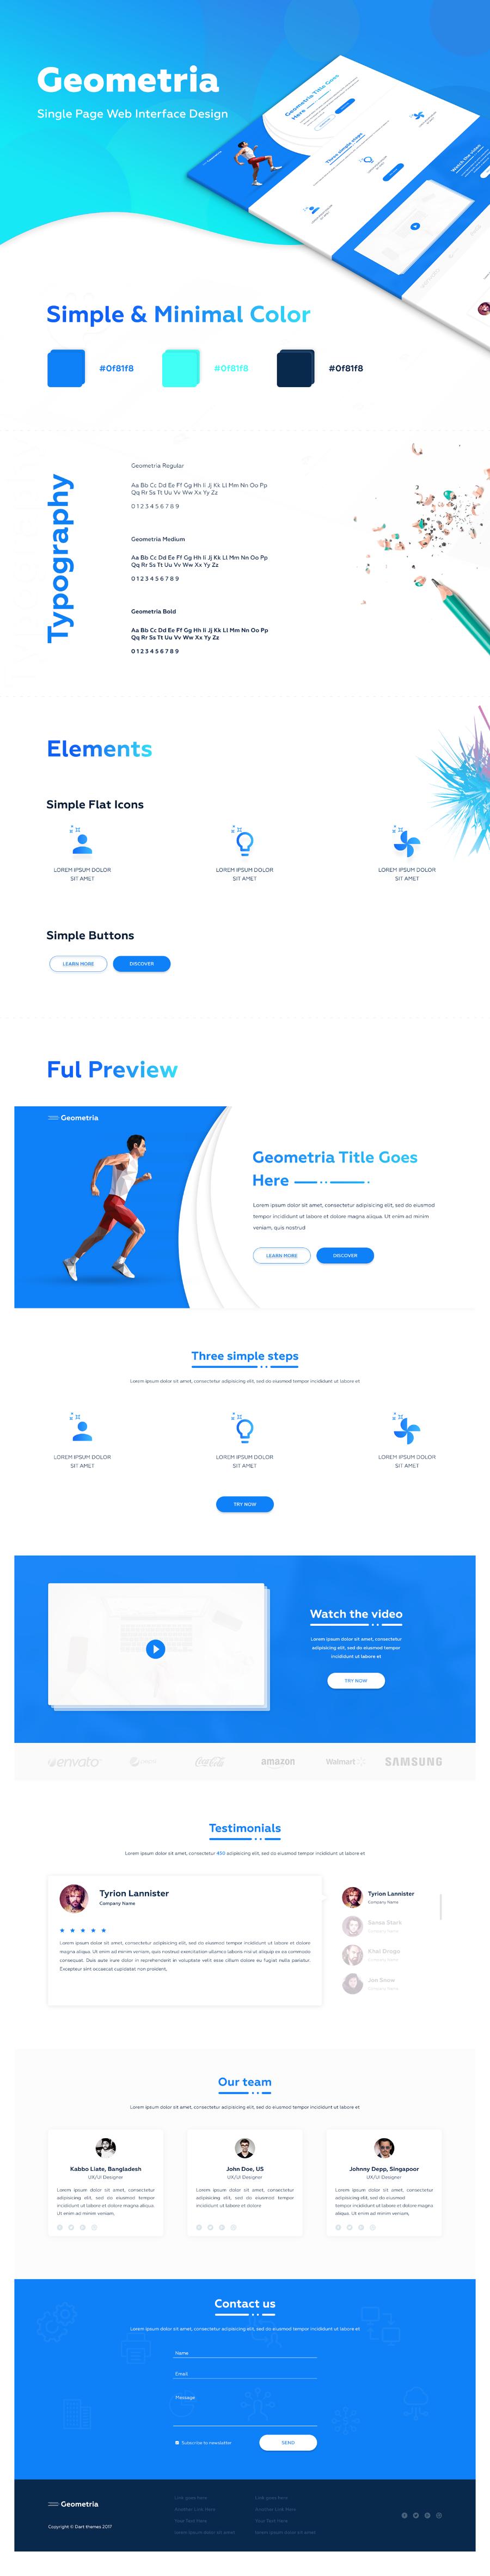 Geometria Free Landing Page